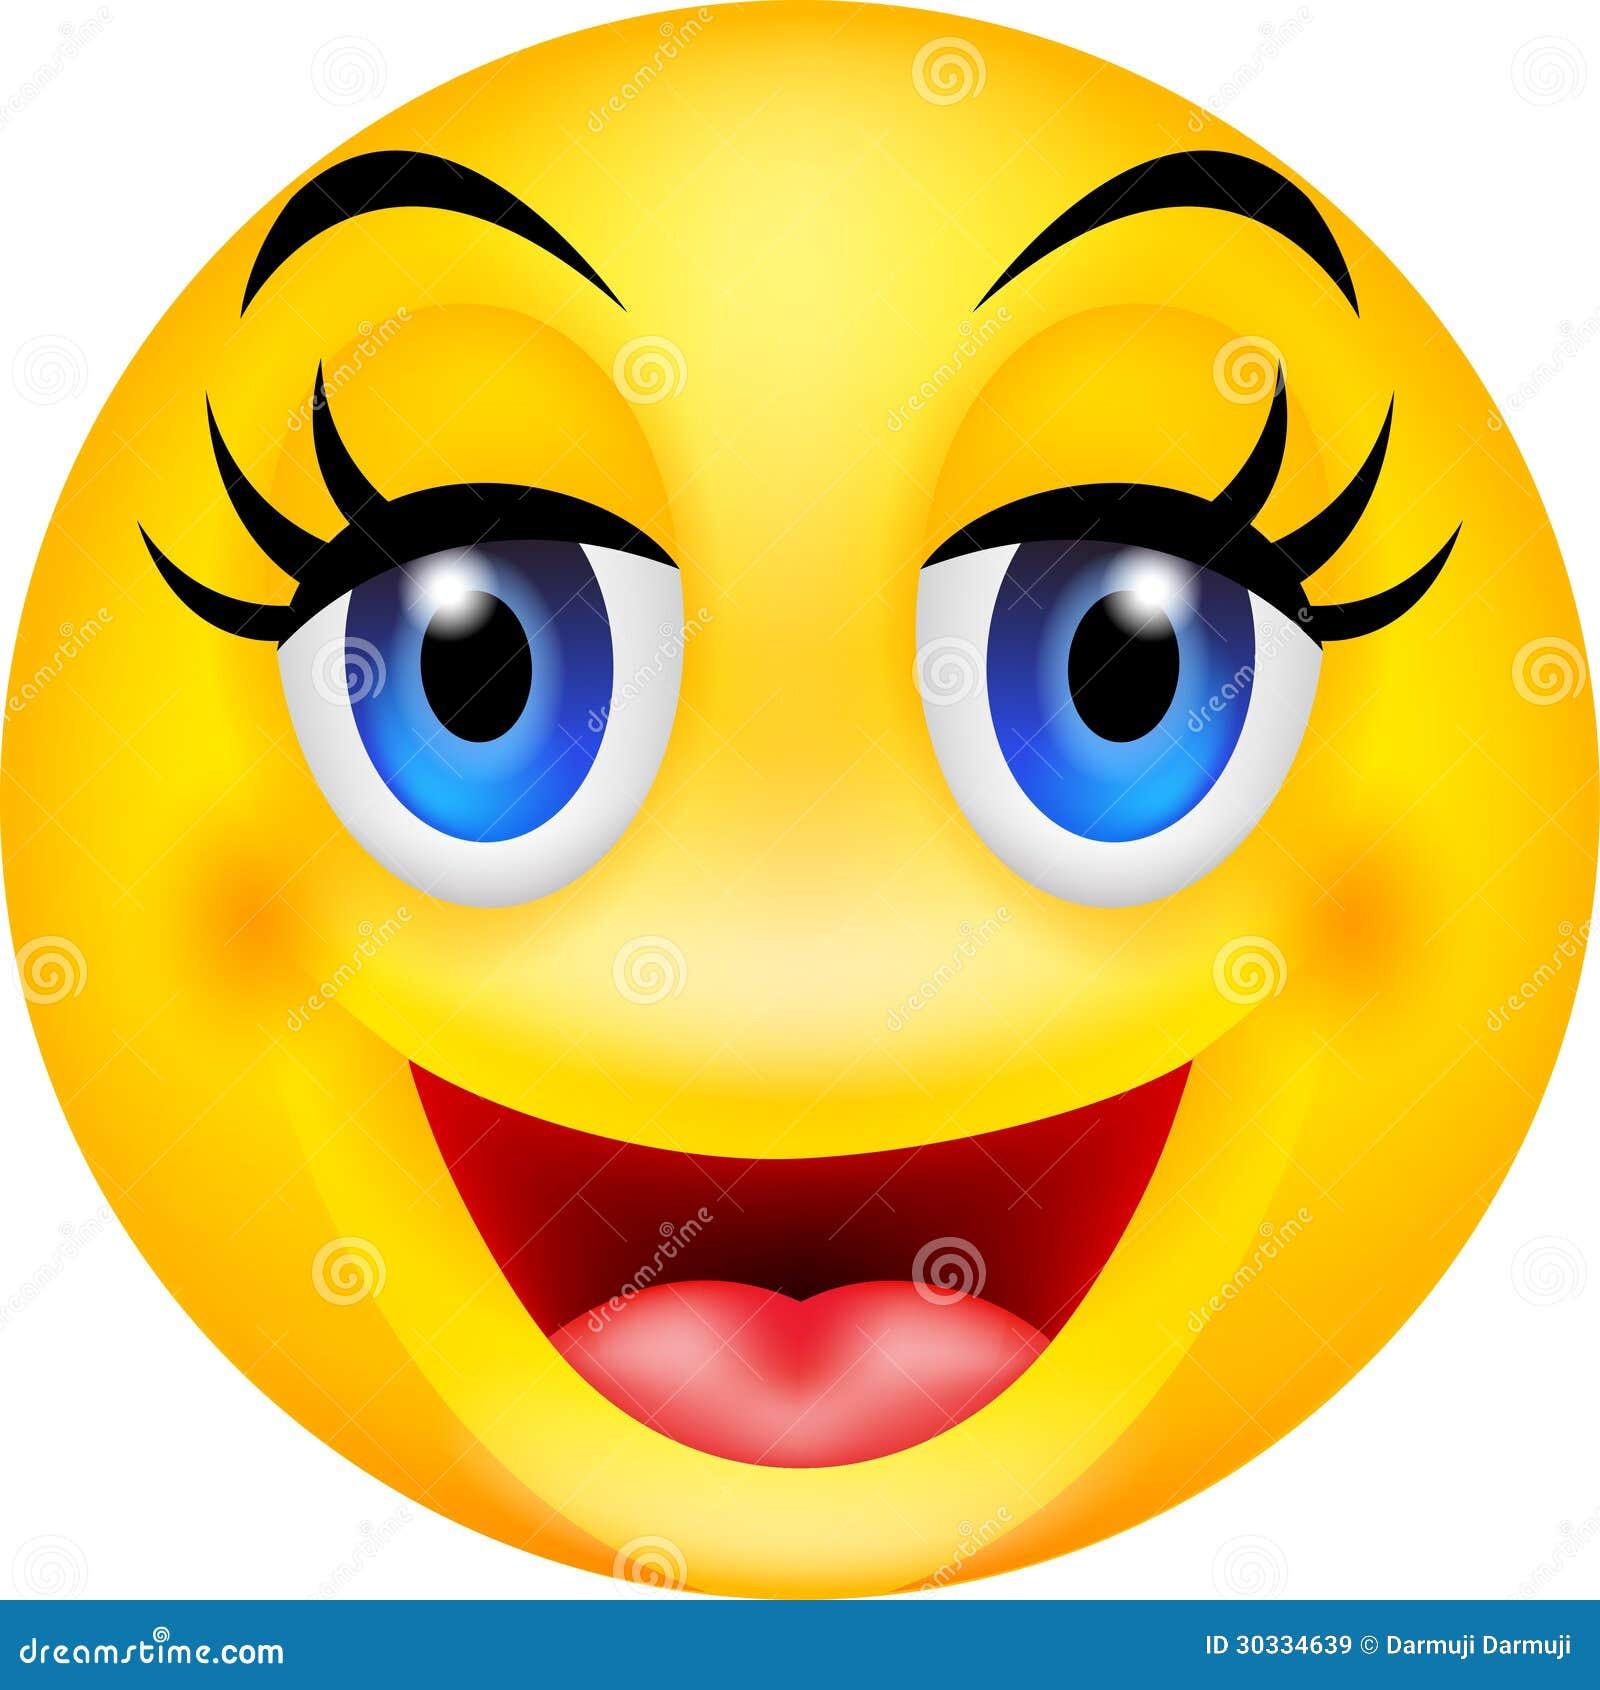 Funny smile emoticon Smile